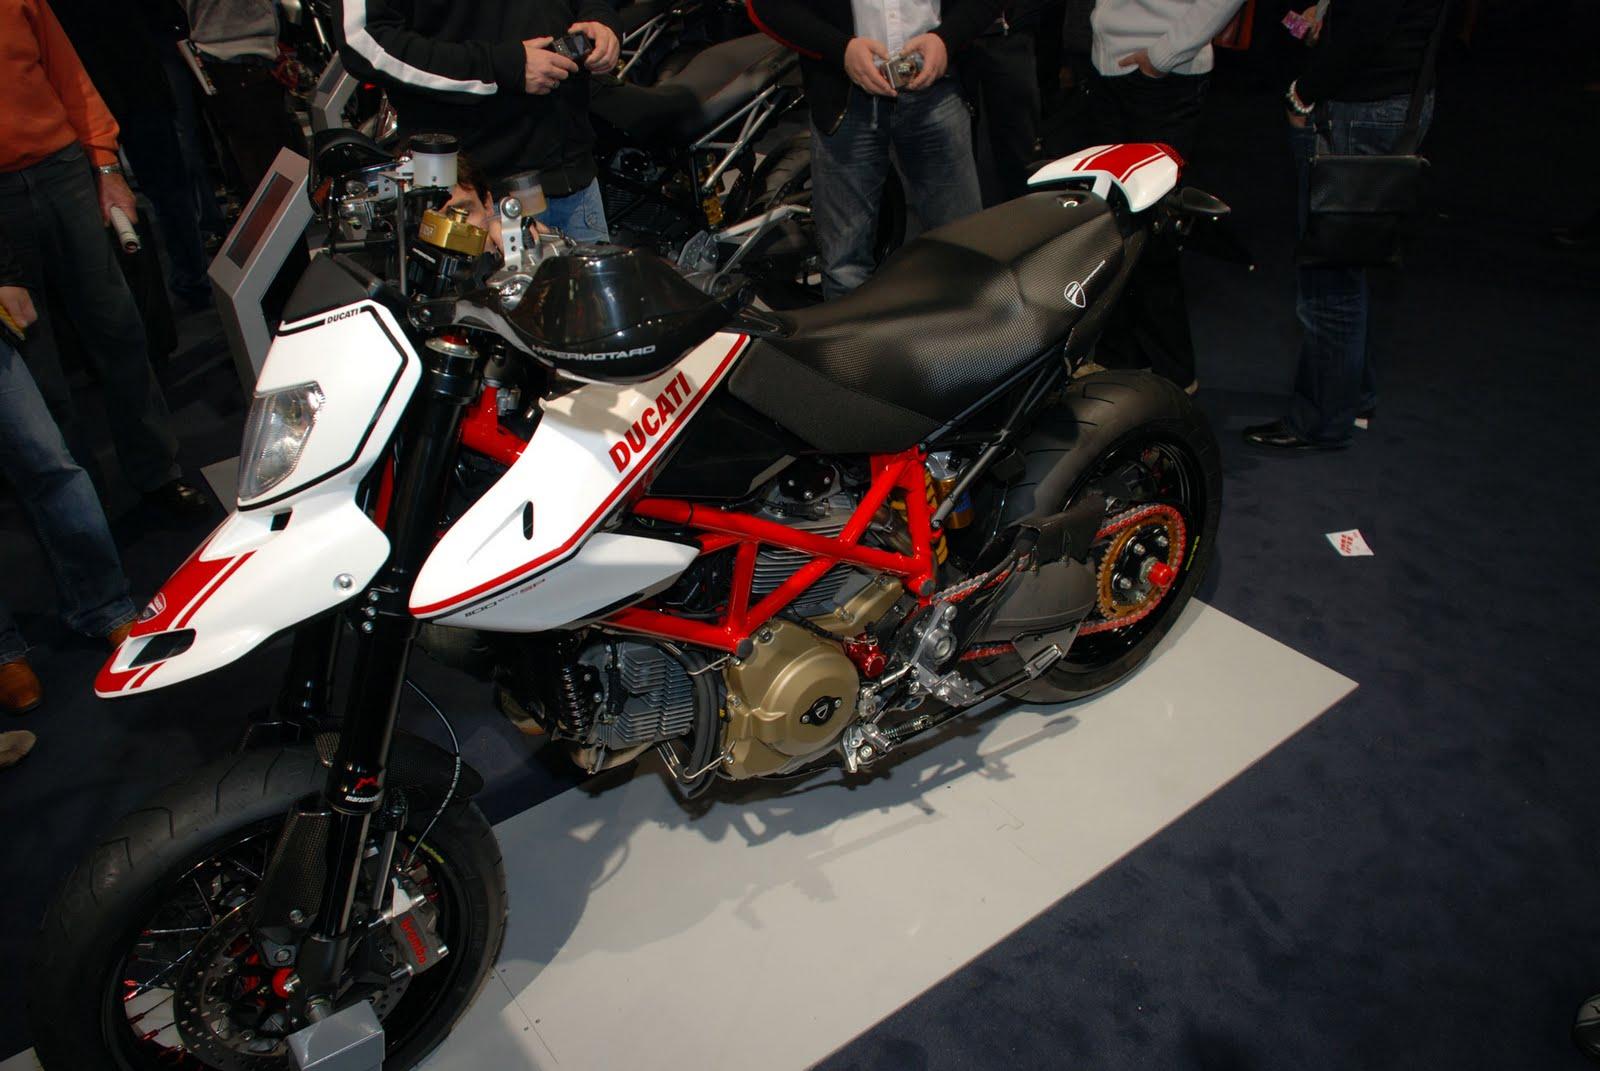 [2010-ducati-hypermotard-1100-evo-sp-accessories-7.jpg]